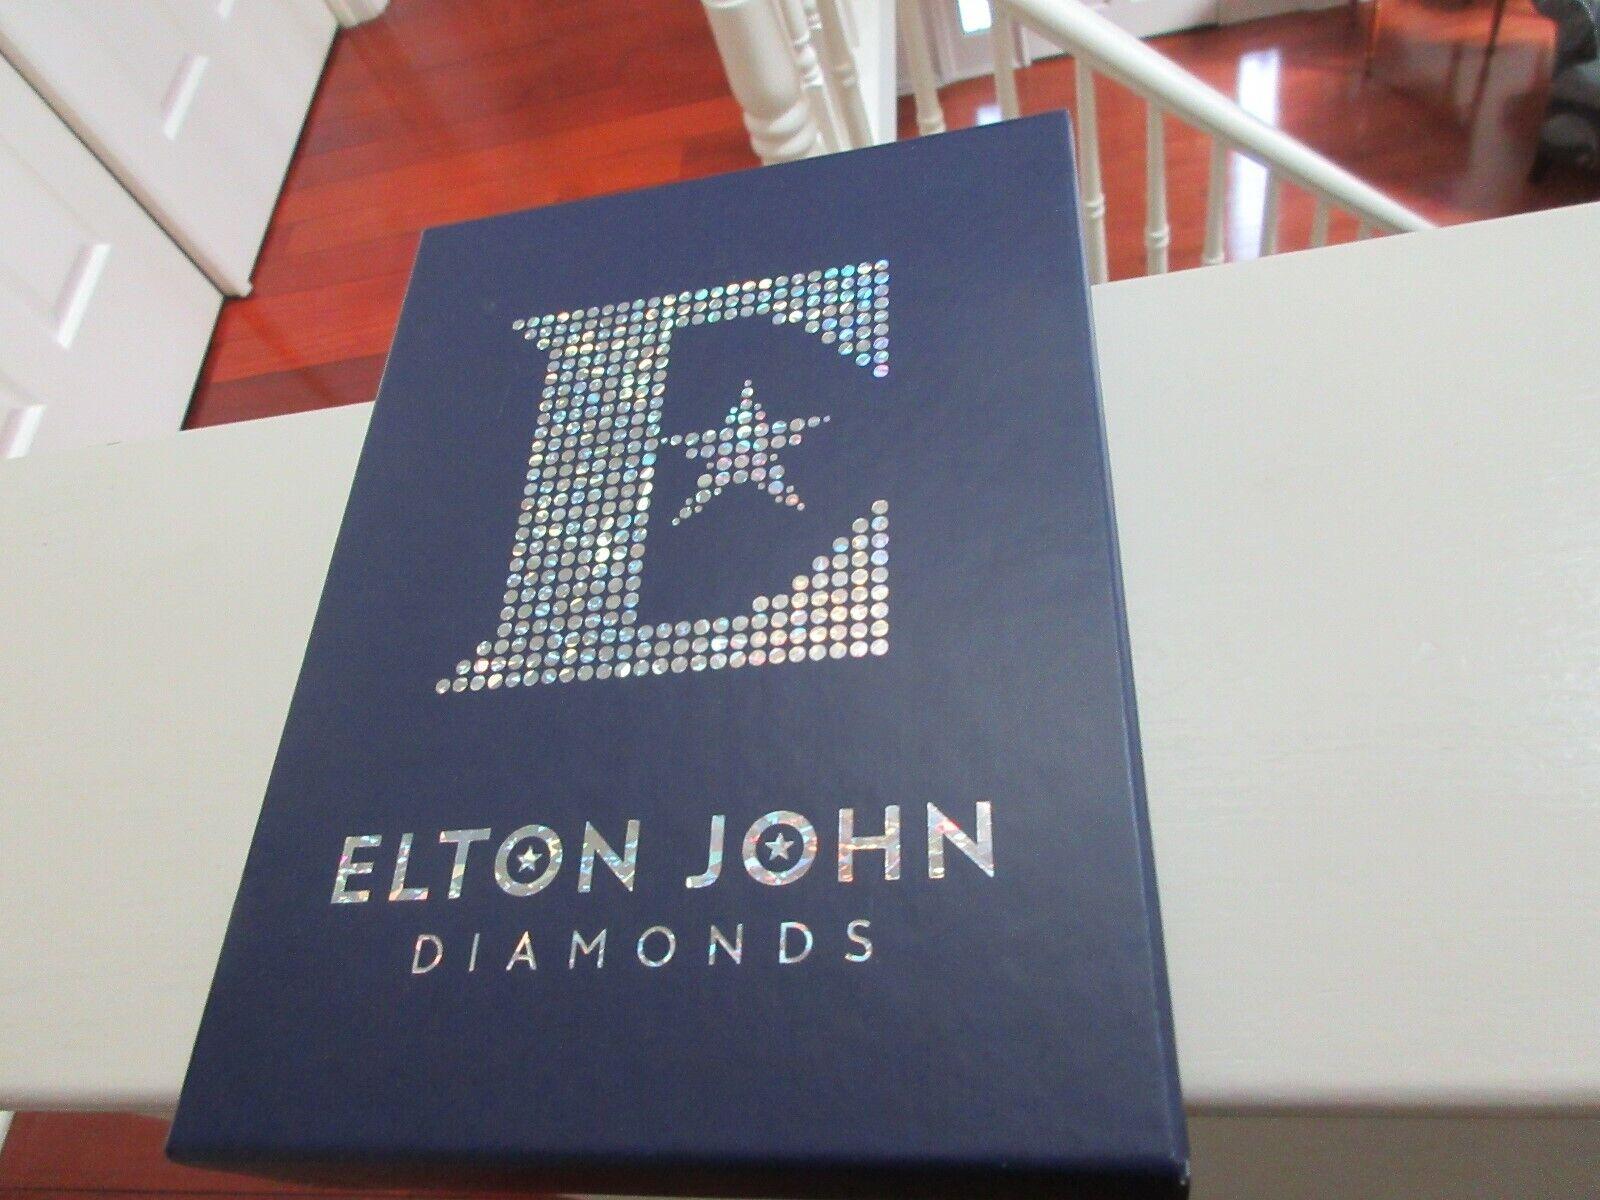 Diamonds * by Elton John (CD, Nov-2017, 3 Discs, Mercur